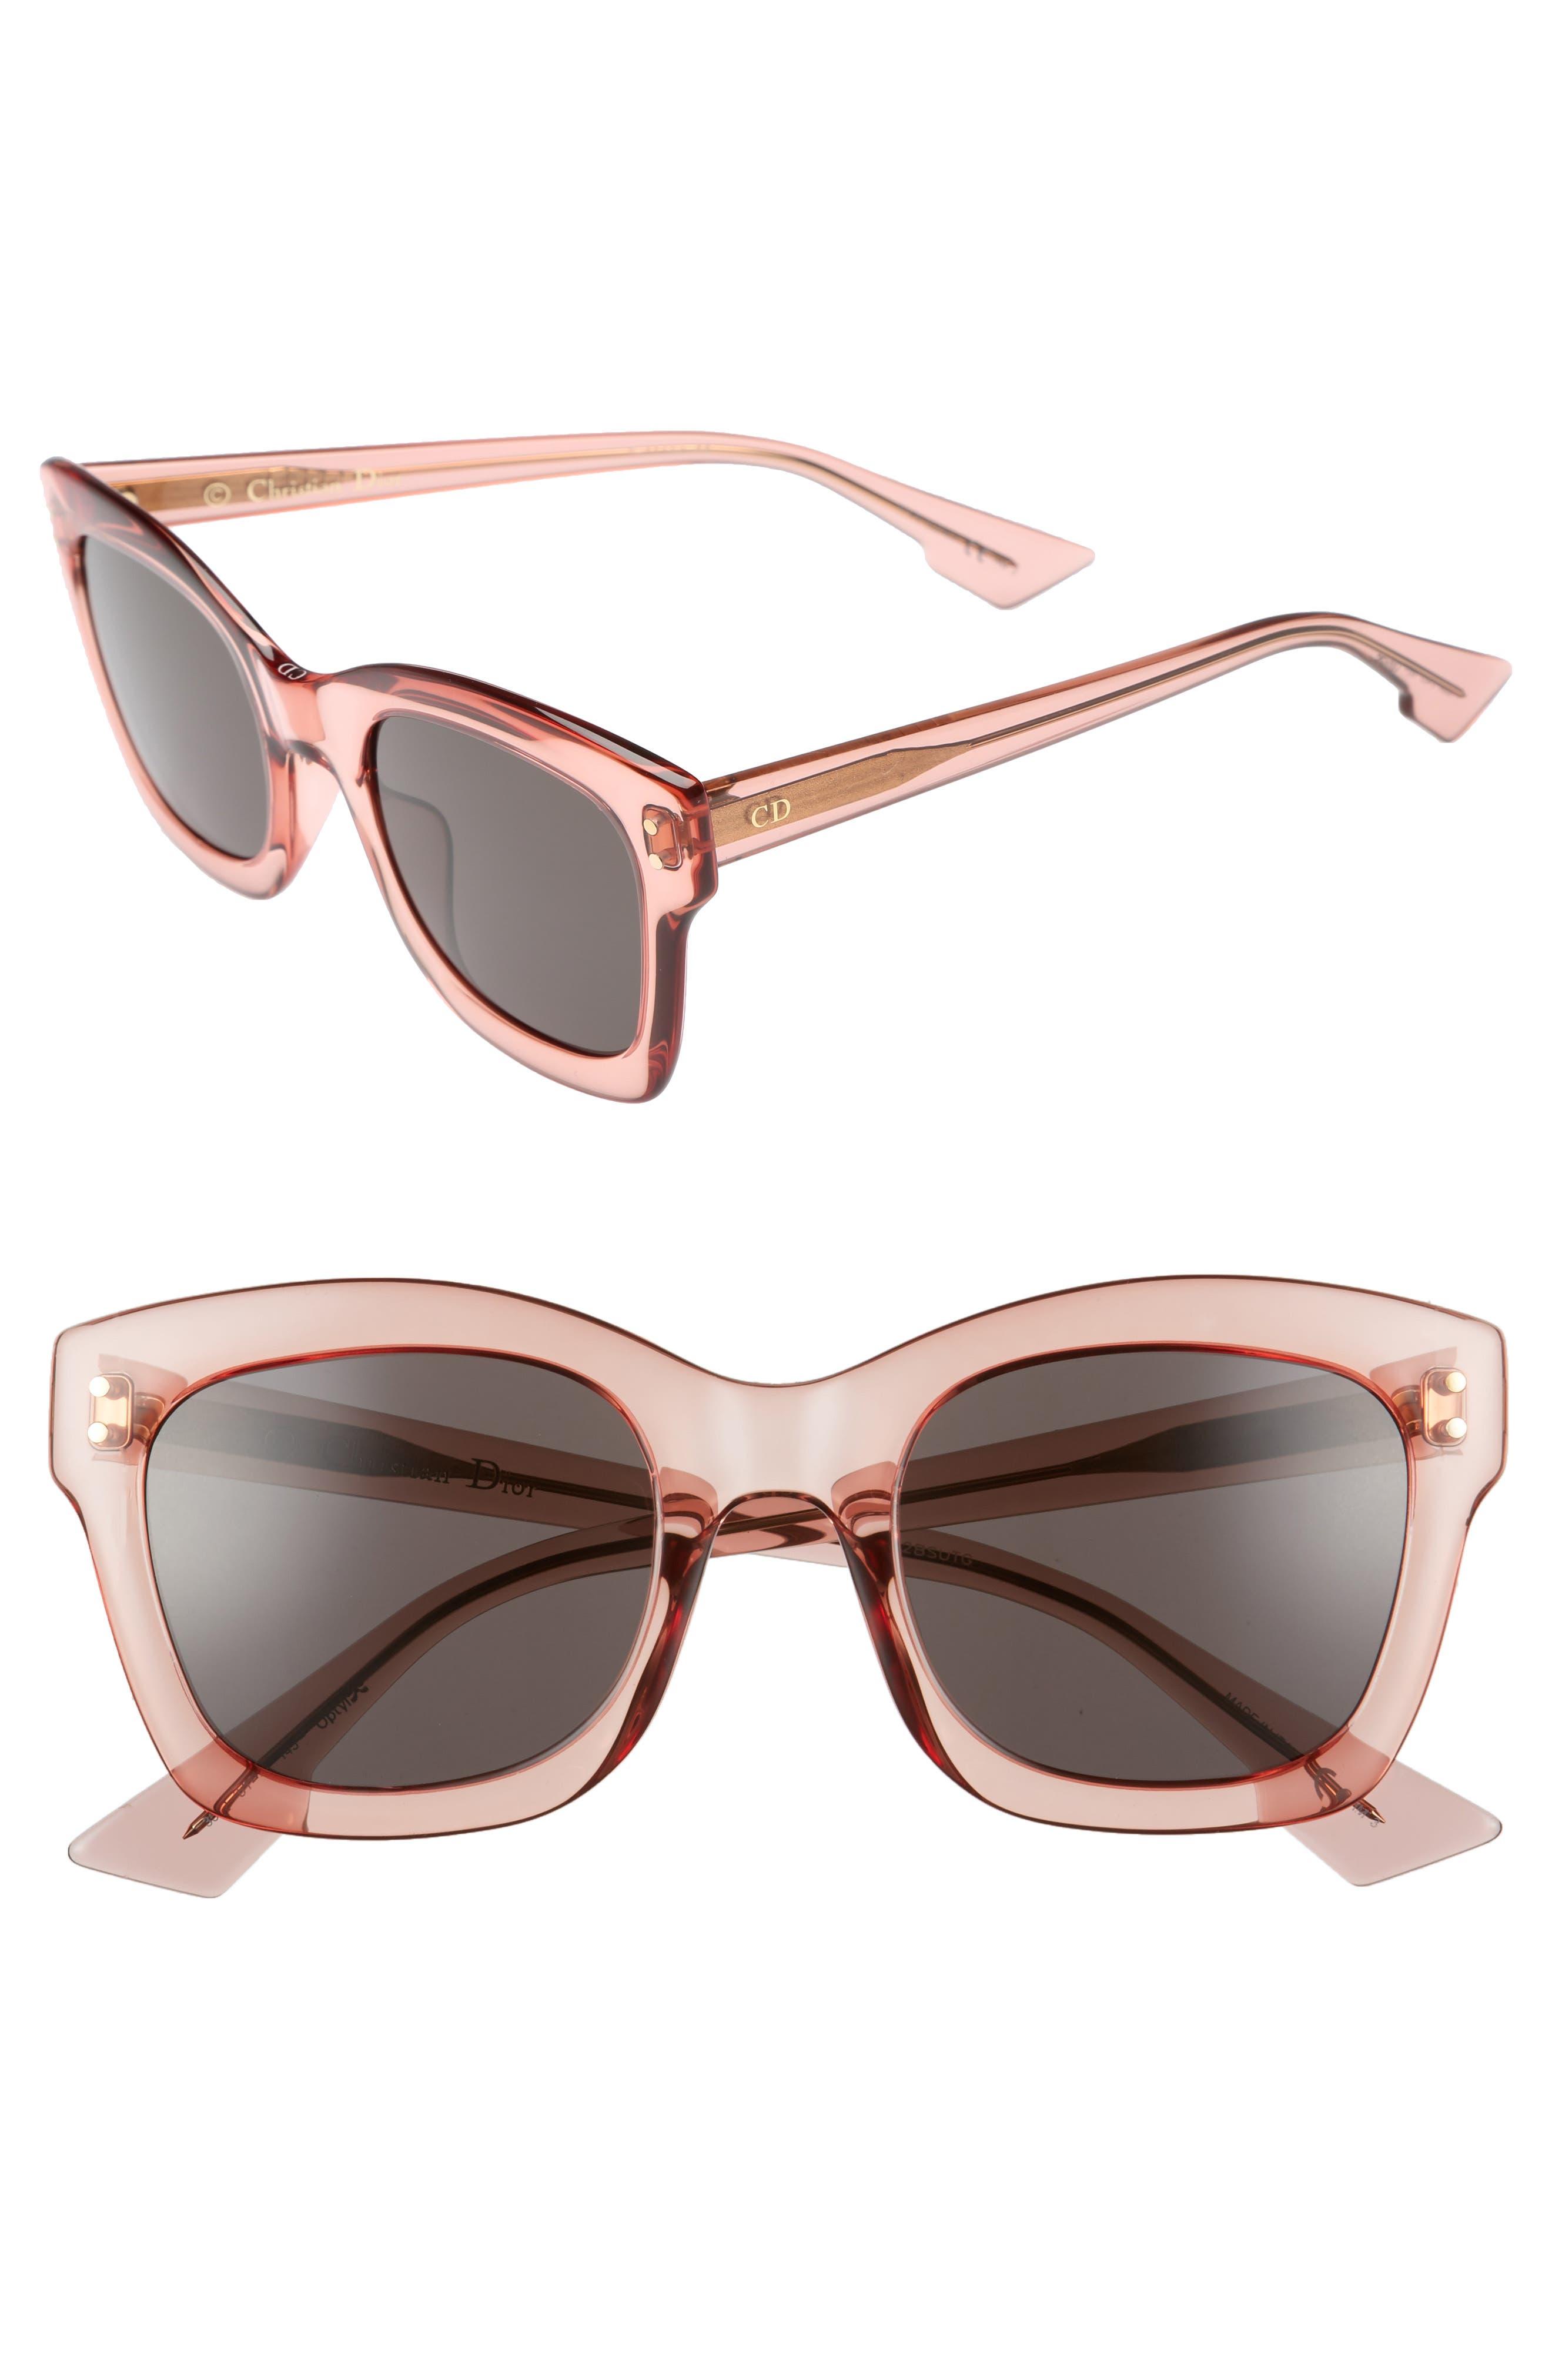 Main Image - Dior Izon 51mm Sunglasses